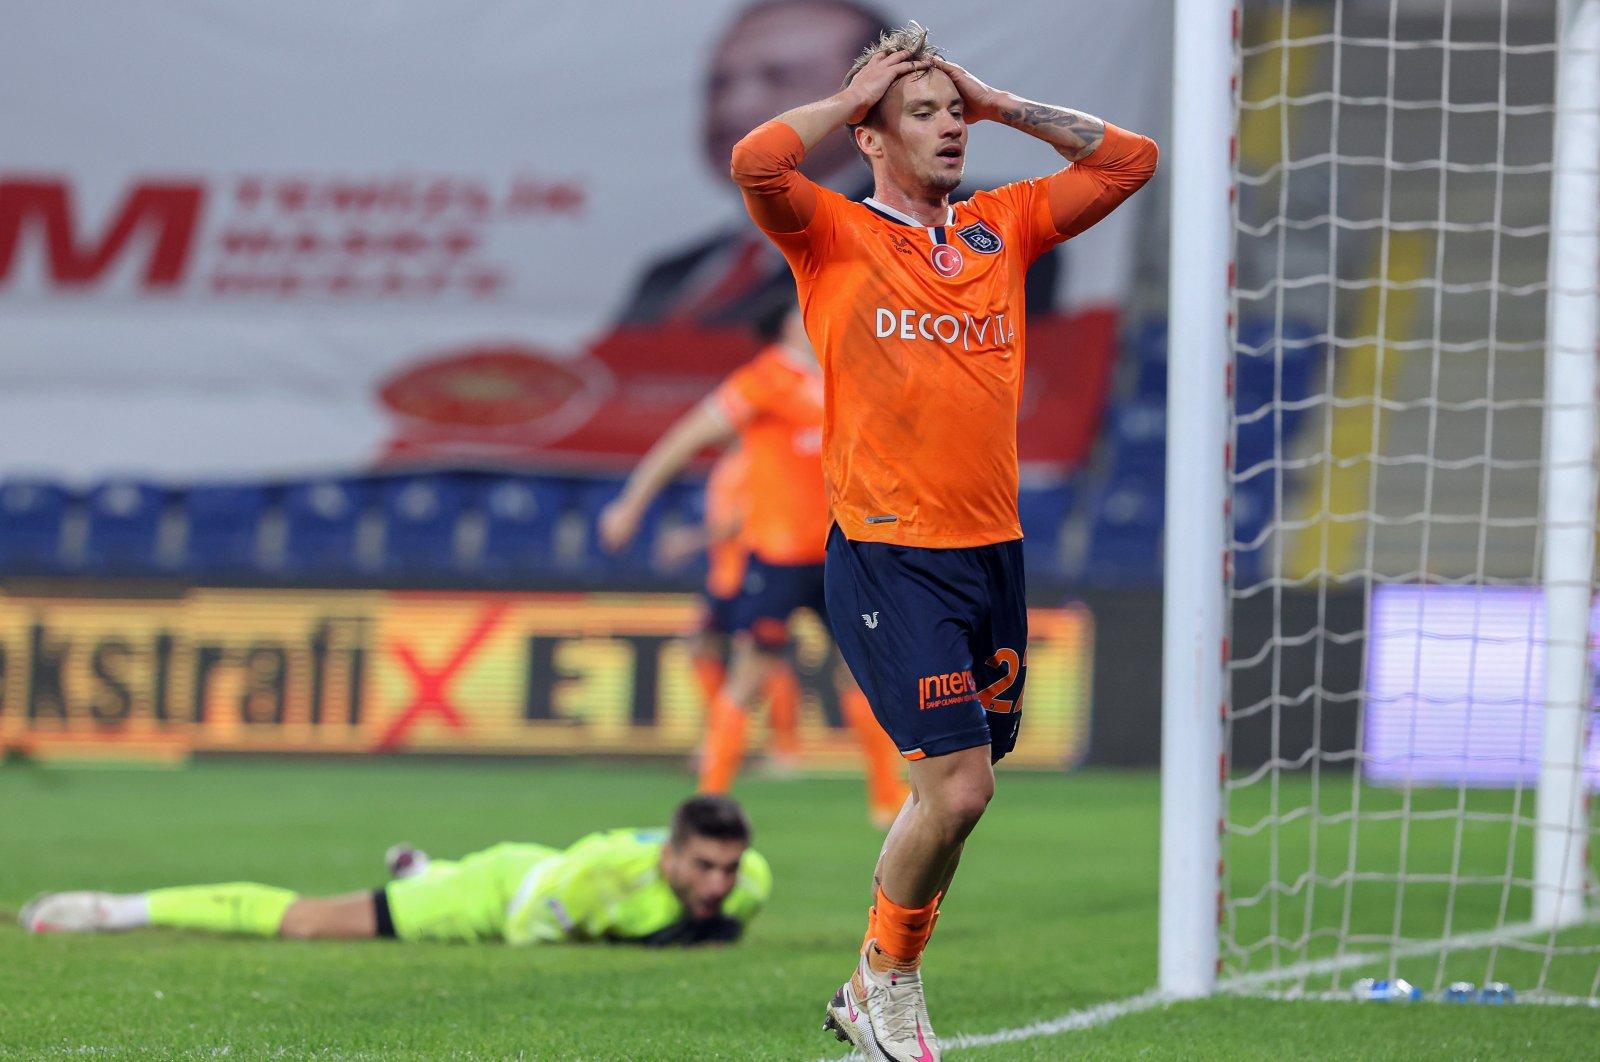 Başakşehir's Fredrik Gulbrandsen reacts after missing a shot during a Süper Lig match against Kasımpaşa at the Fatih Terim Stadium, in Istanbul, Turkey, Dec. 27, 2020. (AA Photo)